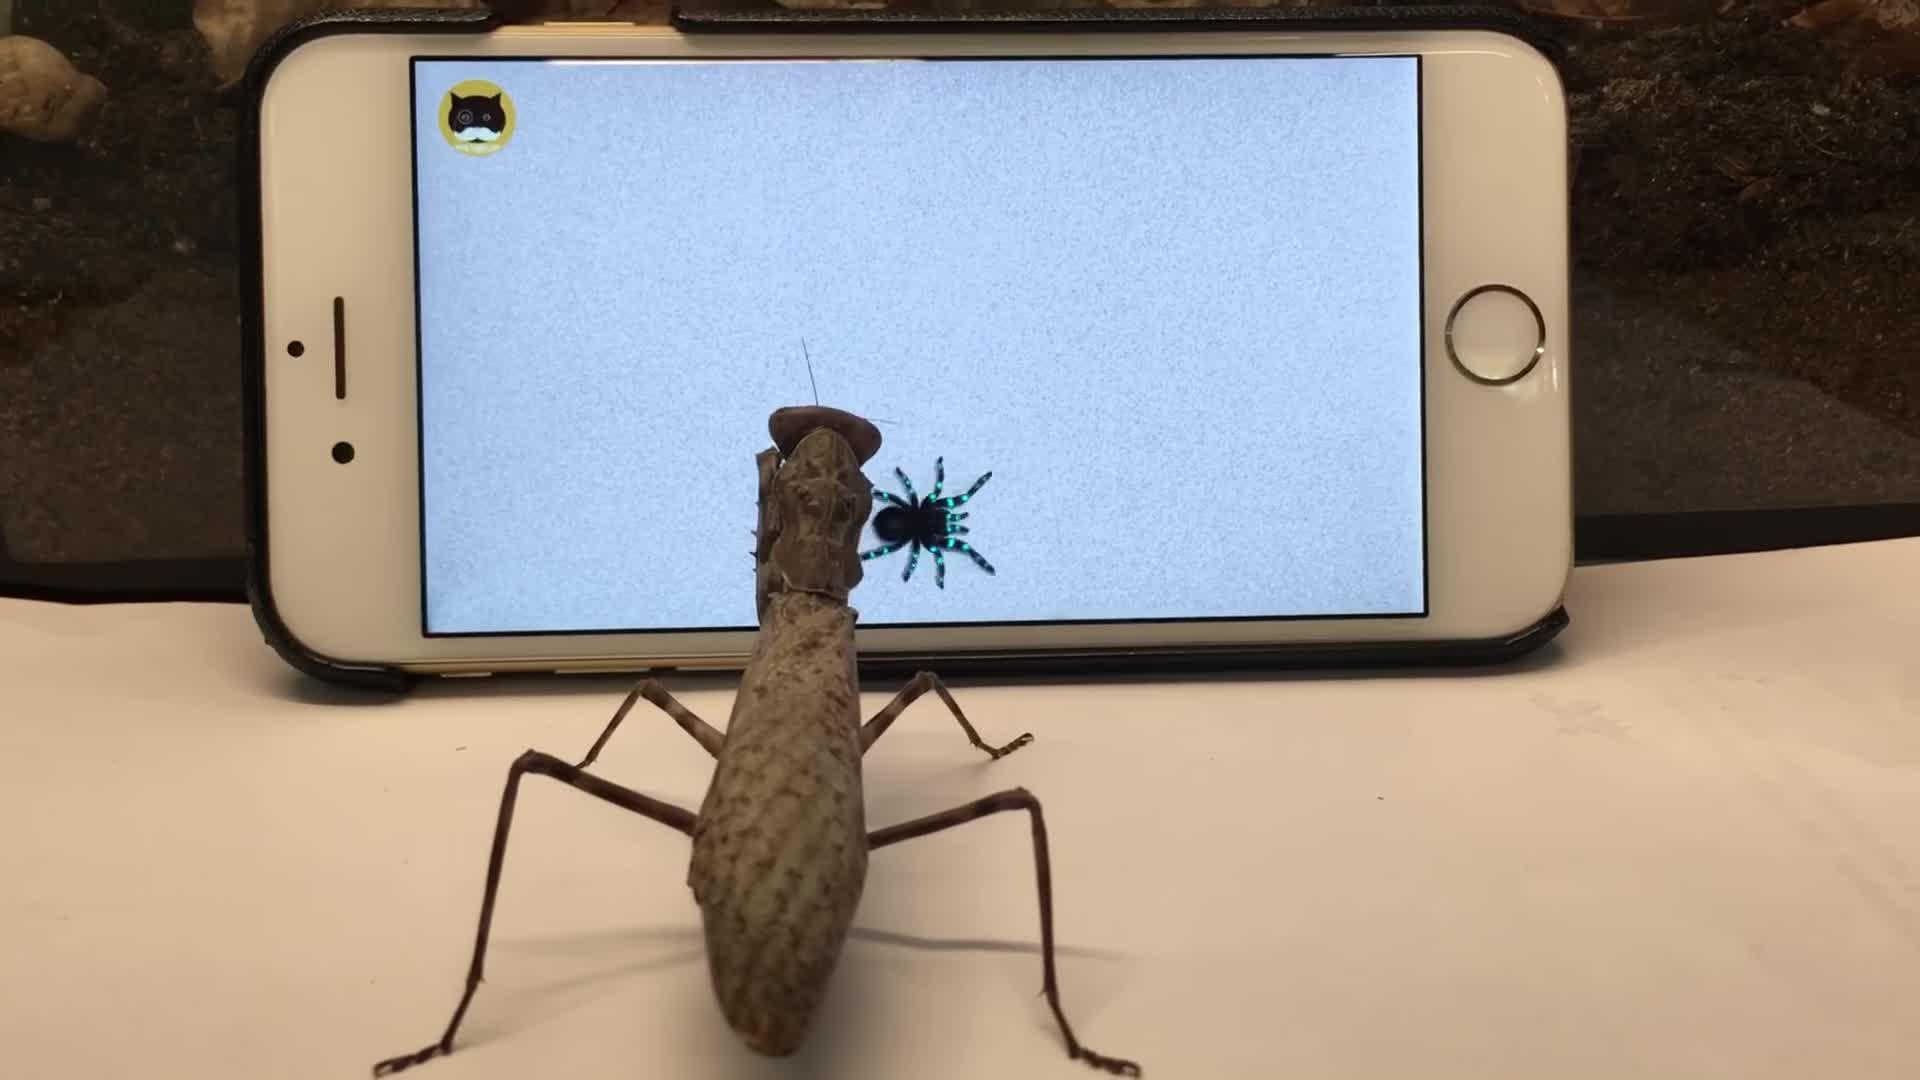 InsecthausTV, Pets & Animals, Praying mantis watching TV GIFs